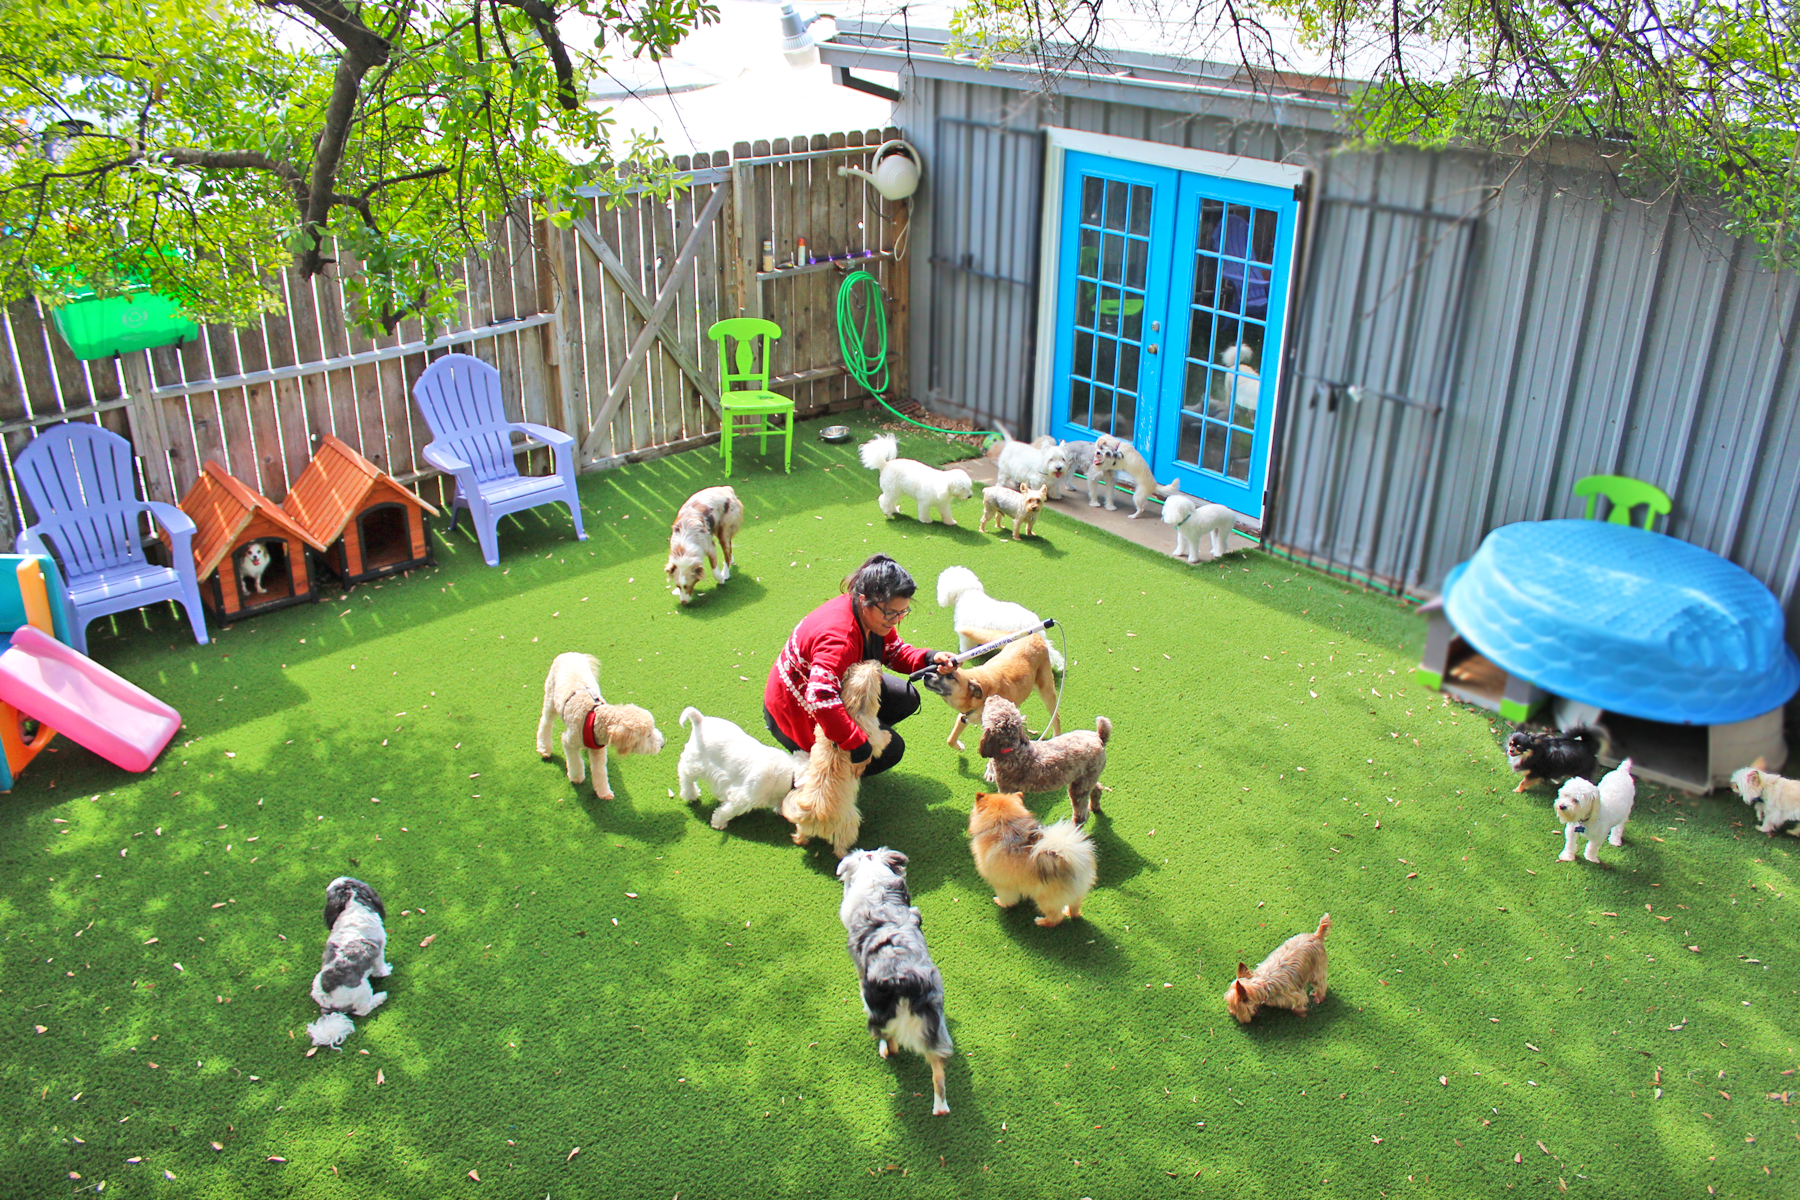 Bldhtx for Best little dog house in texas